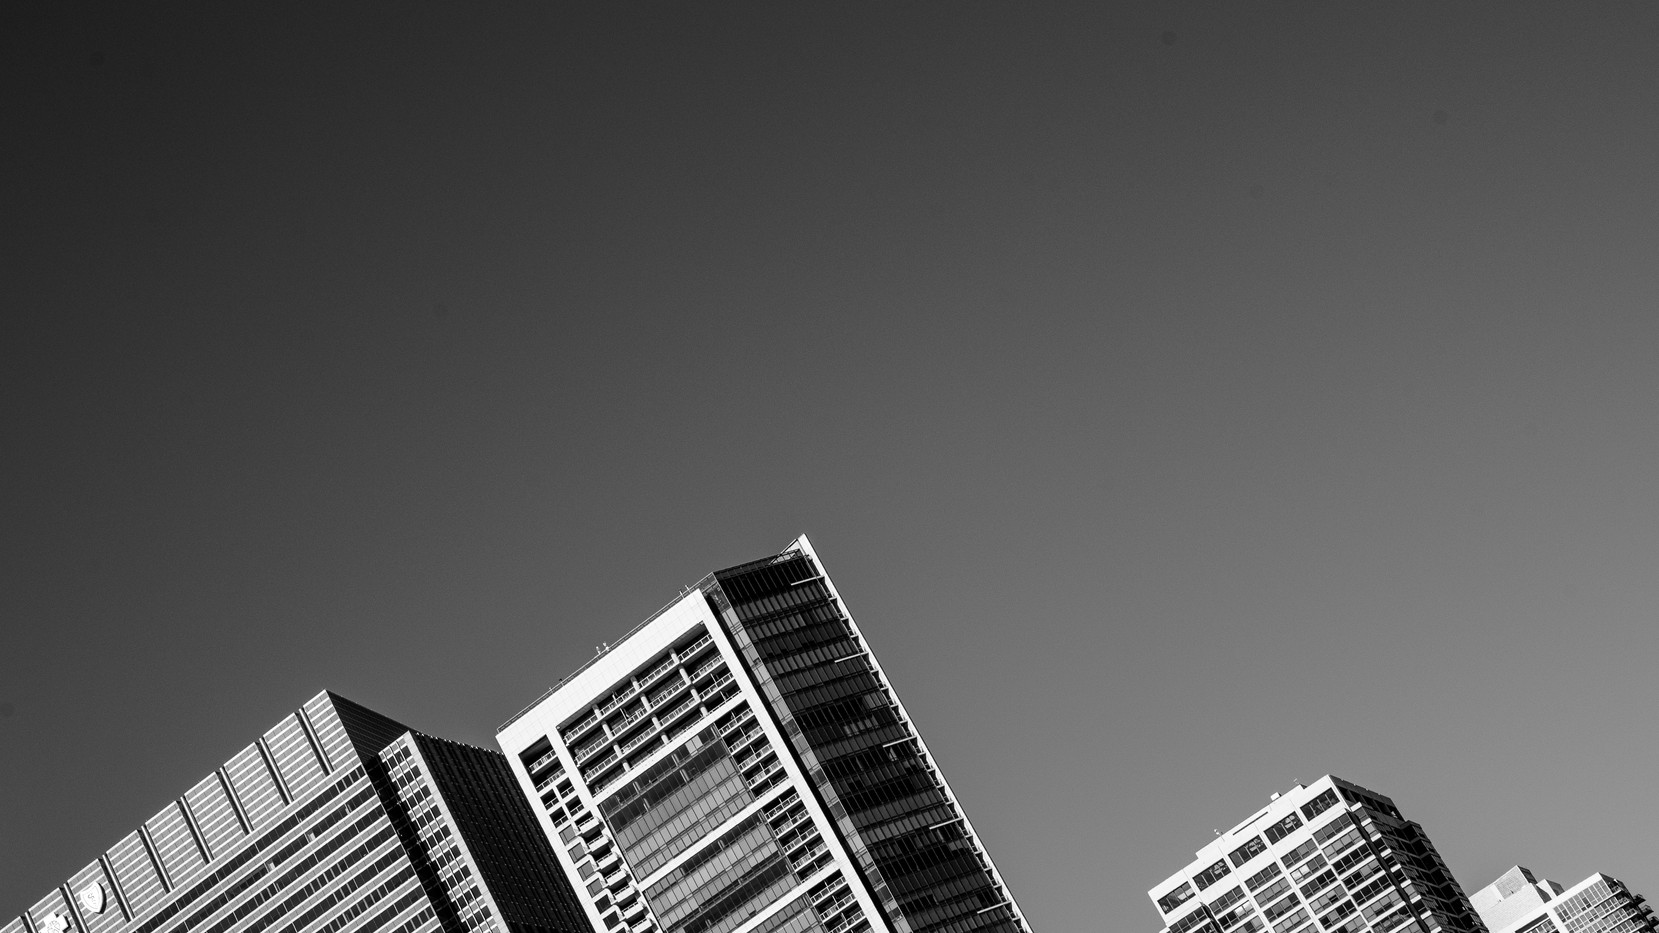 Archistructures #2